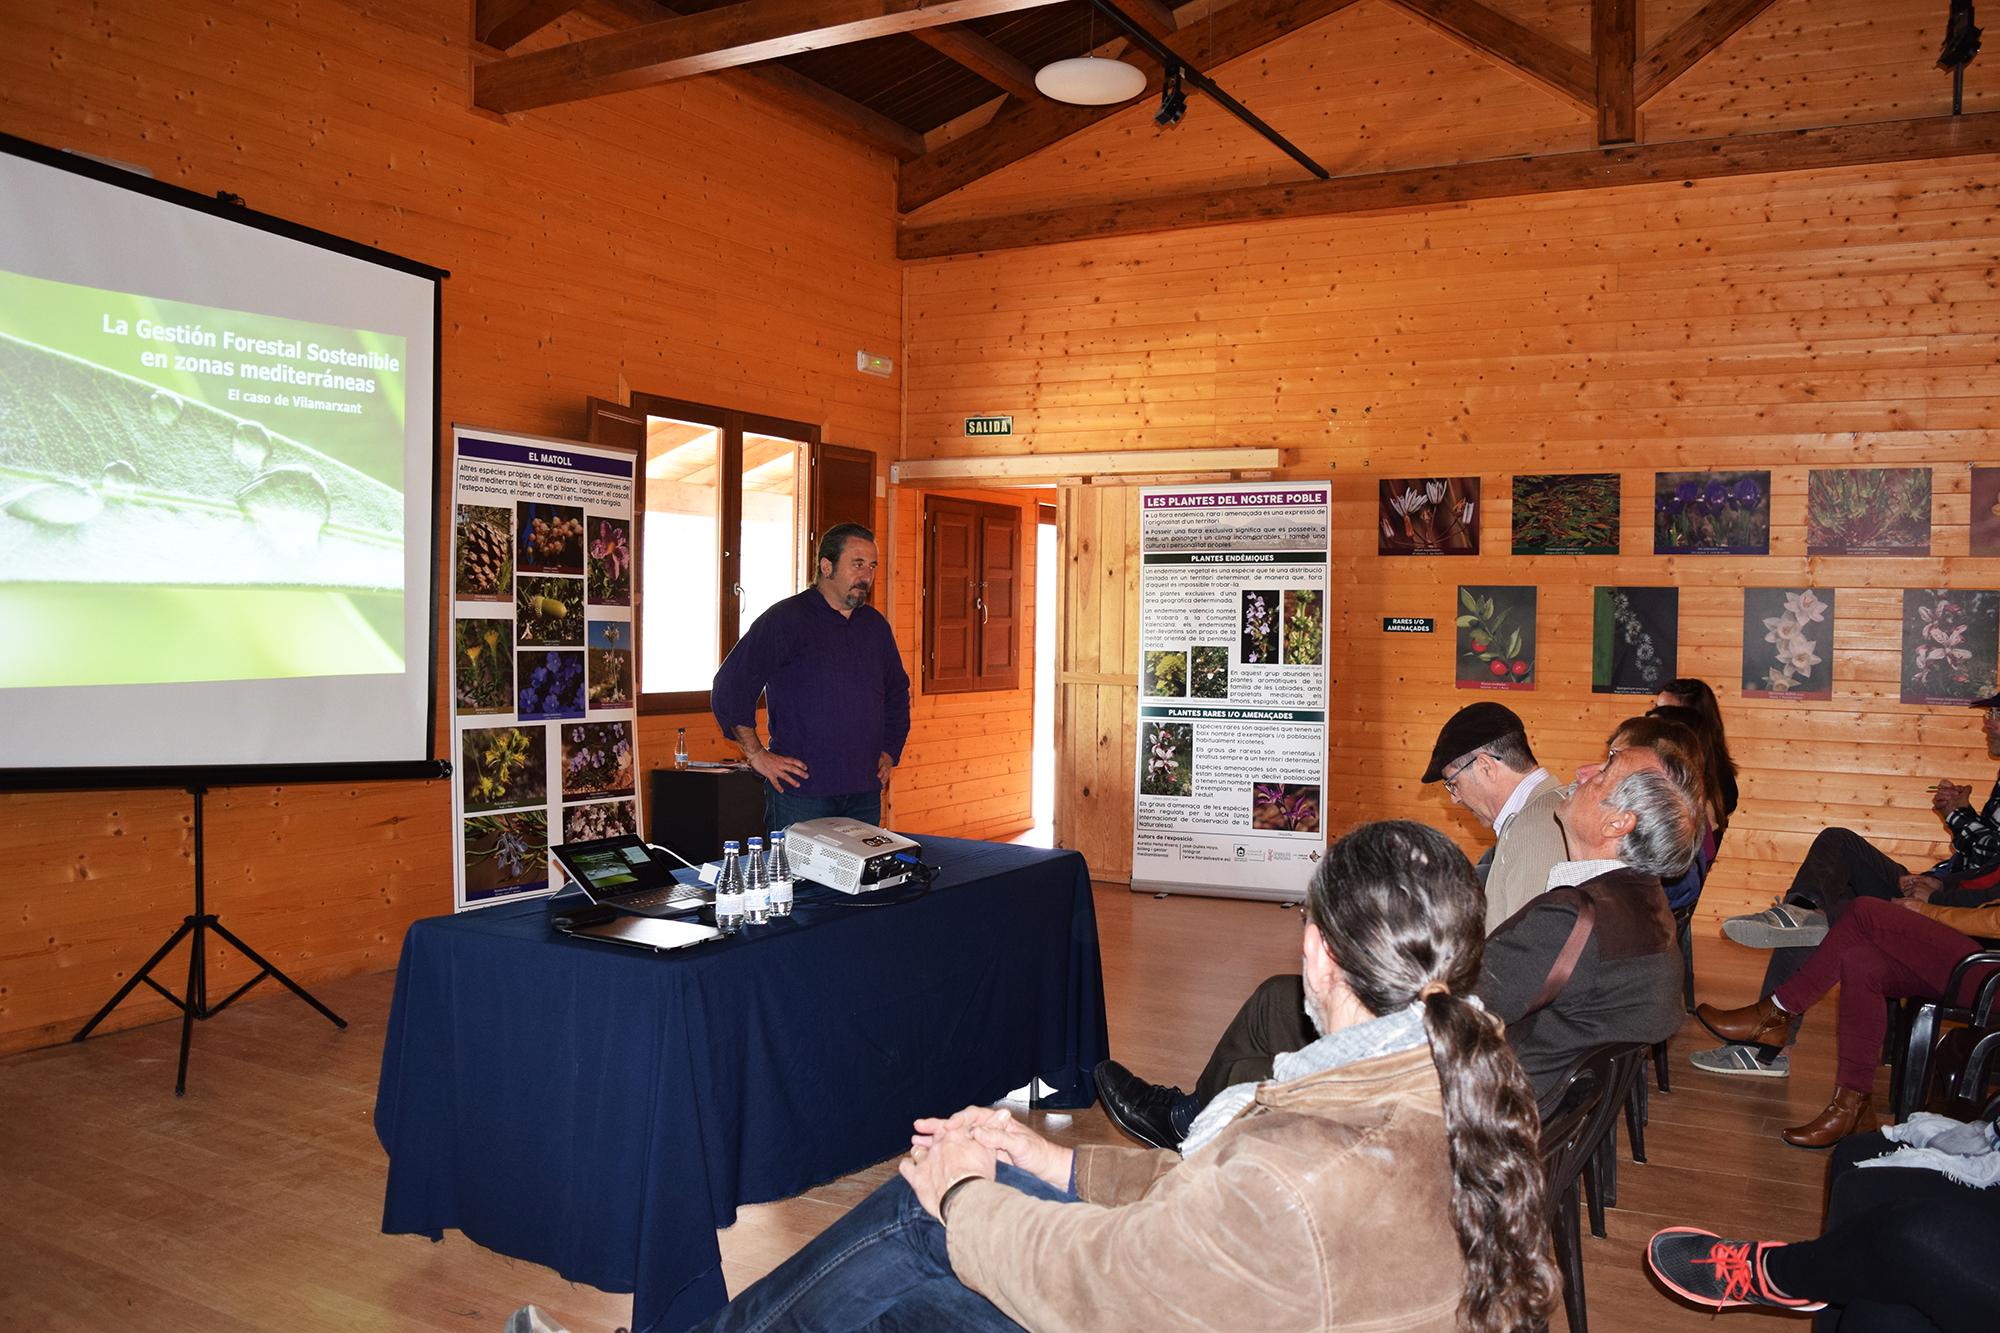 "Este dissabte el Centre de visitants del Parc Natural del Túria va acollir la xarrada ""La gestió forestal sostenible a zones mediterrànies: el cas de Vilamarxant"", amb el professor José Luis Lozano Terrazas."